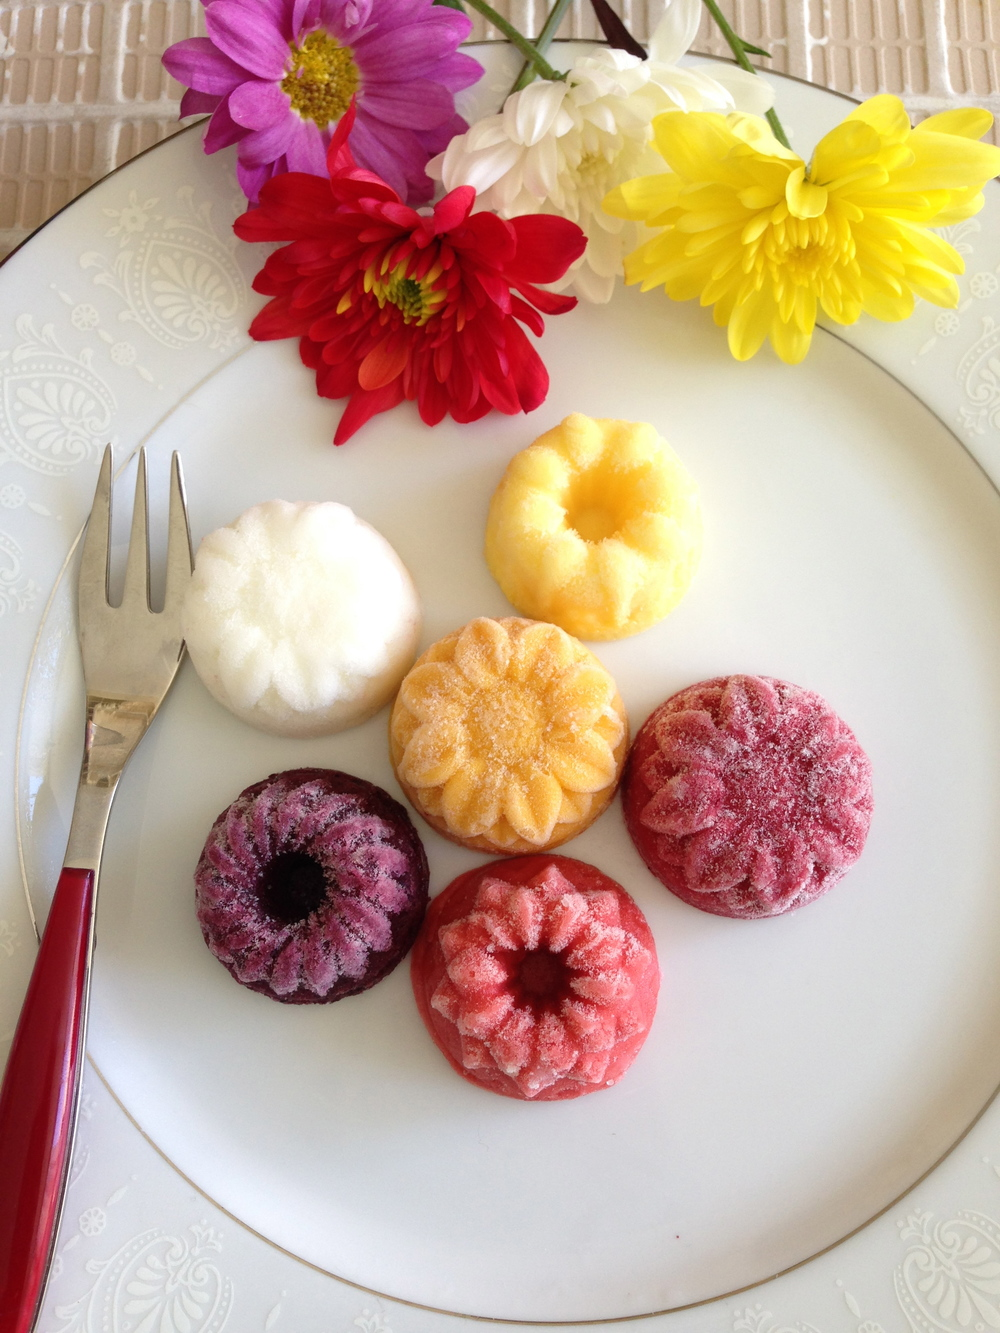 Portioned Sorbets: Blueberry, Fresh Strawberry, Raspberry, Alfonso Mango, Fresh Lemon, Fresh Orange